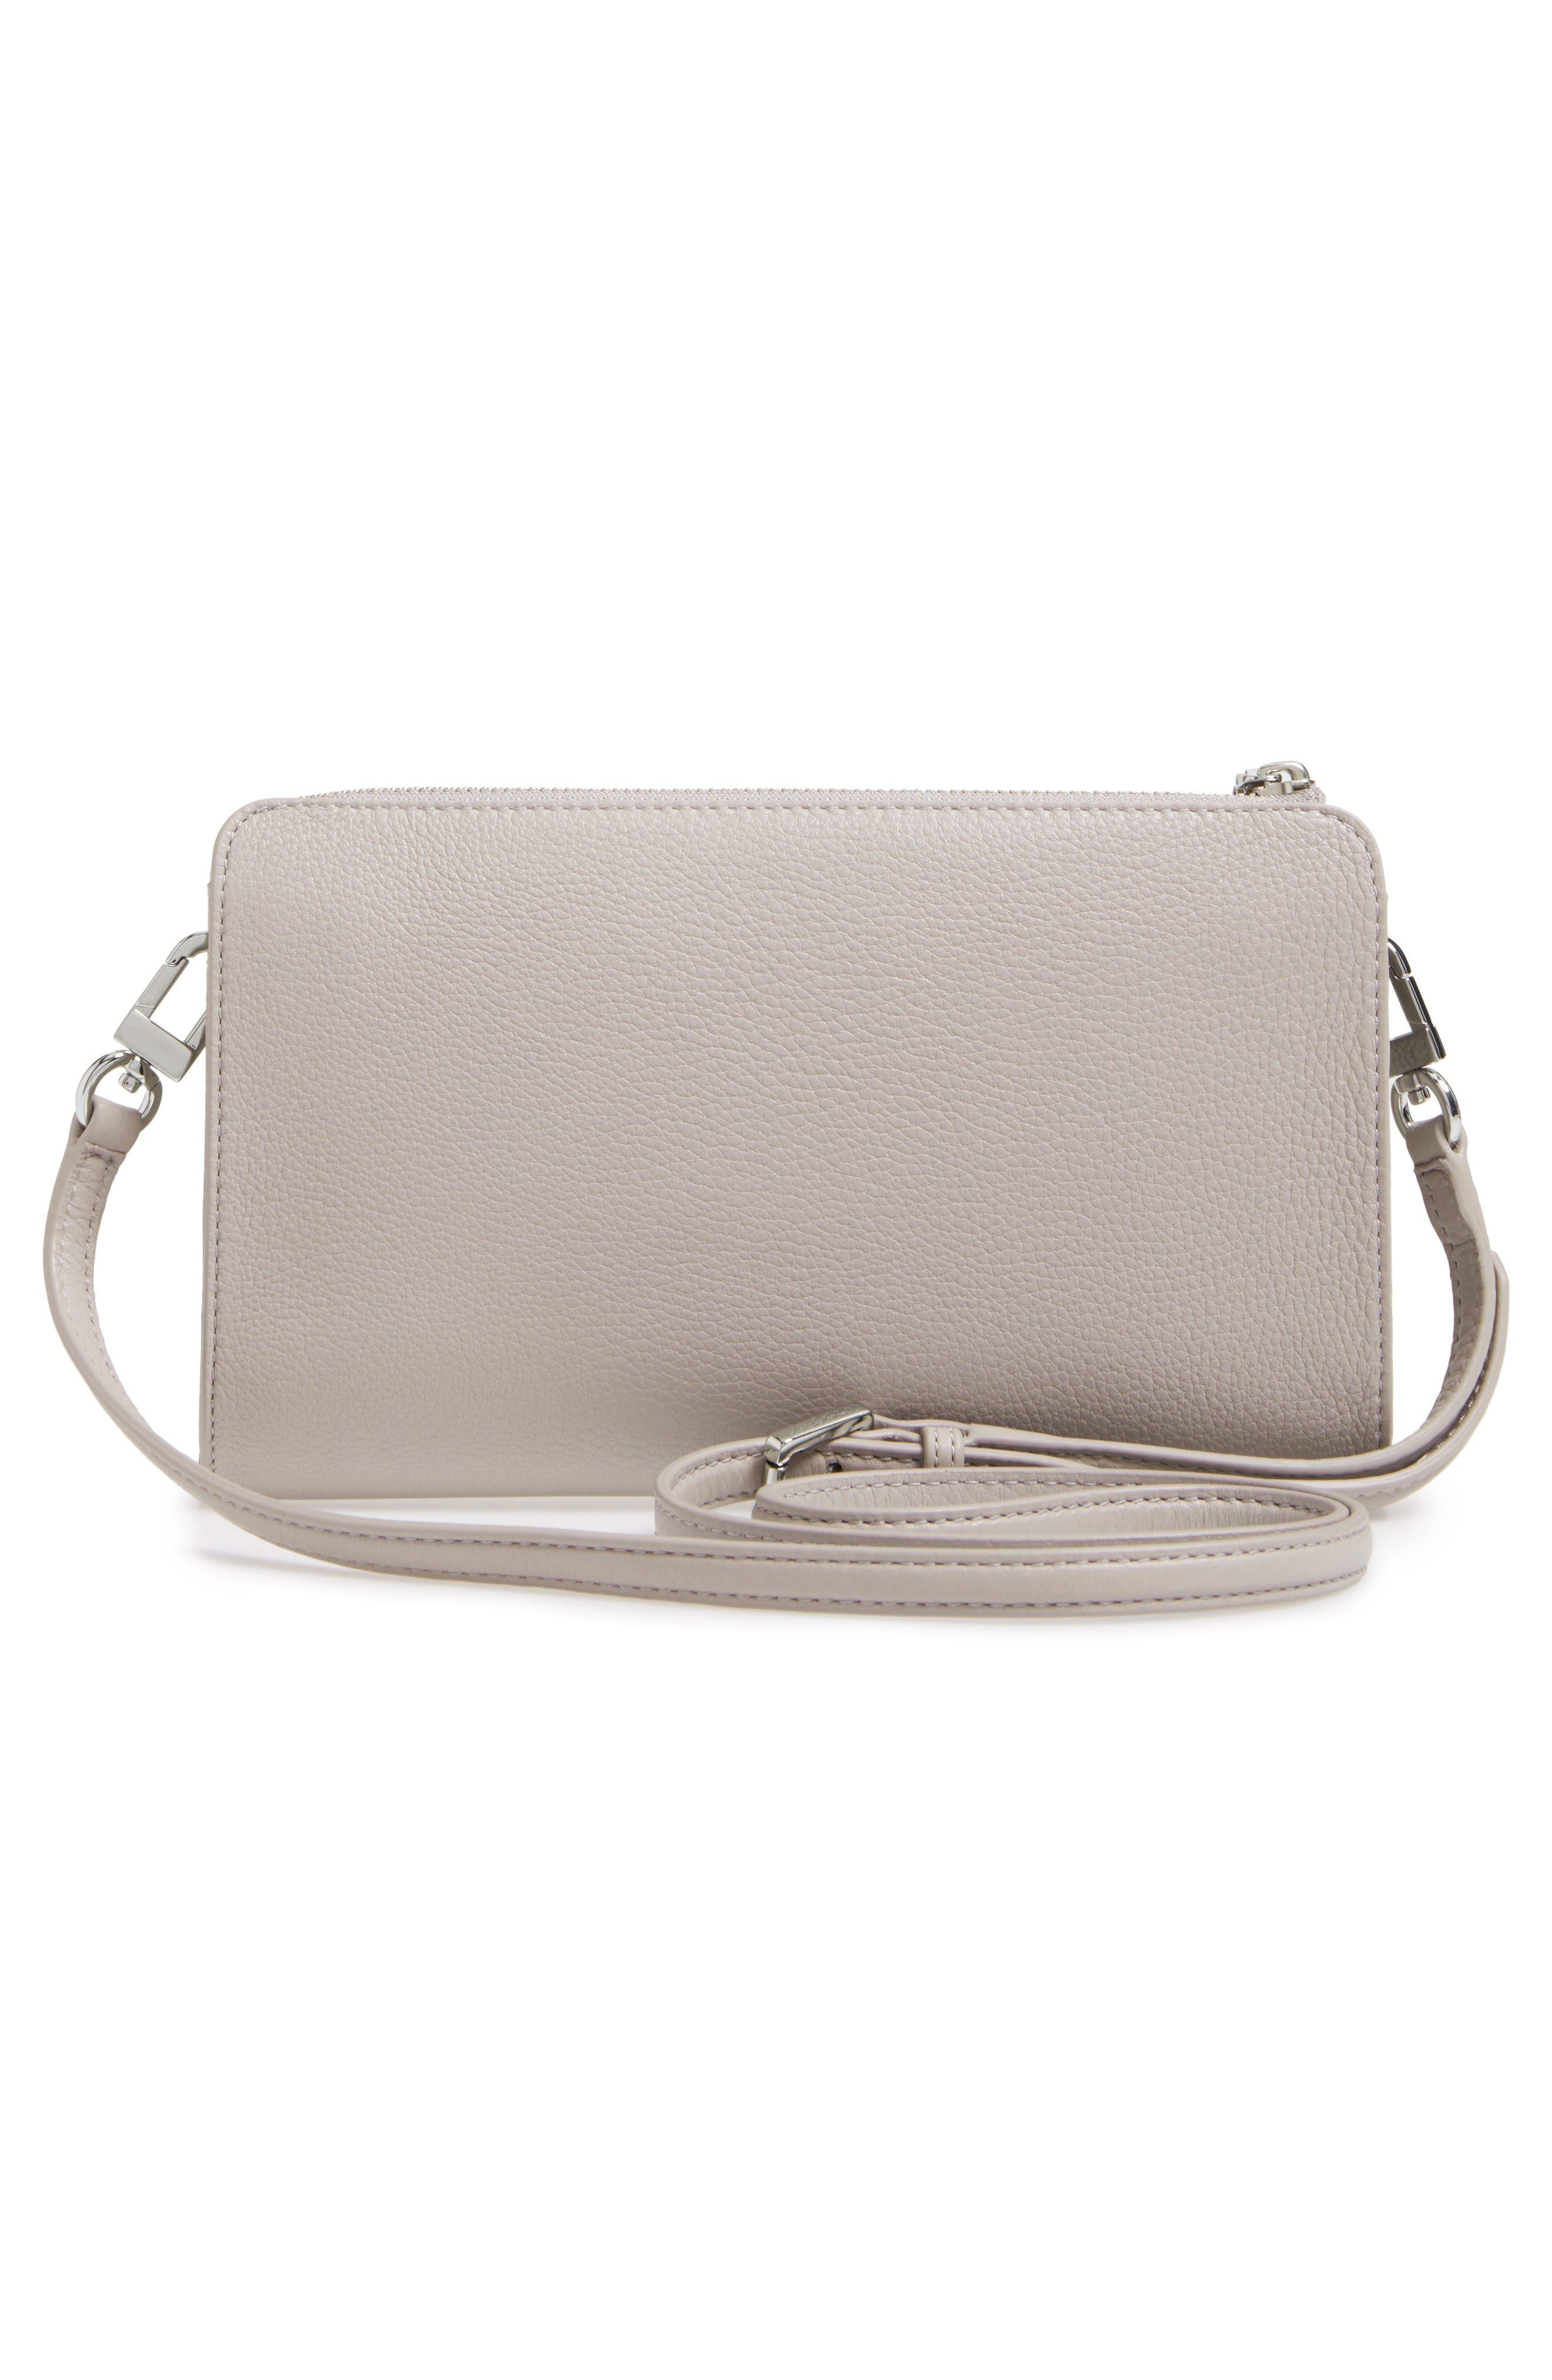 Alternate Image 3  - Tory Burch Robinson Leather Wallet/Crossbody Bag